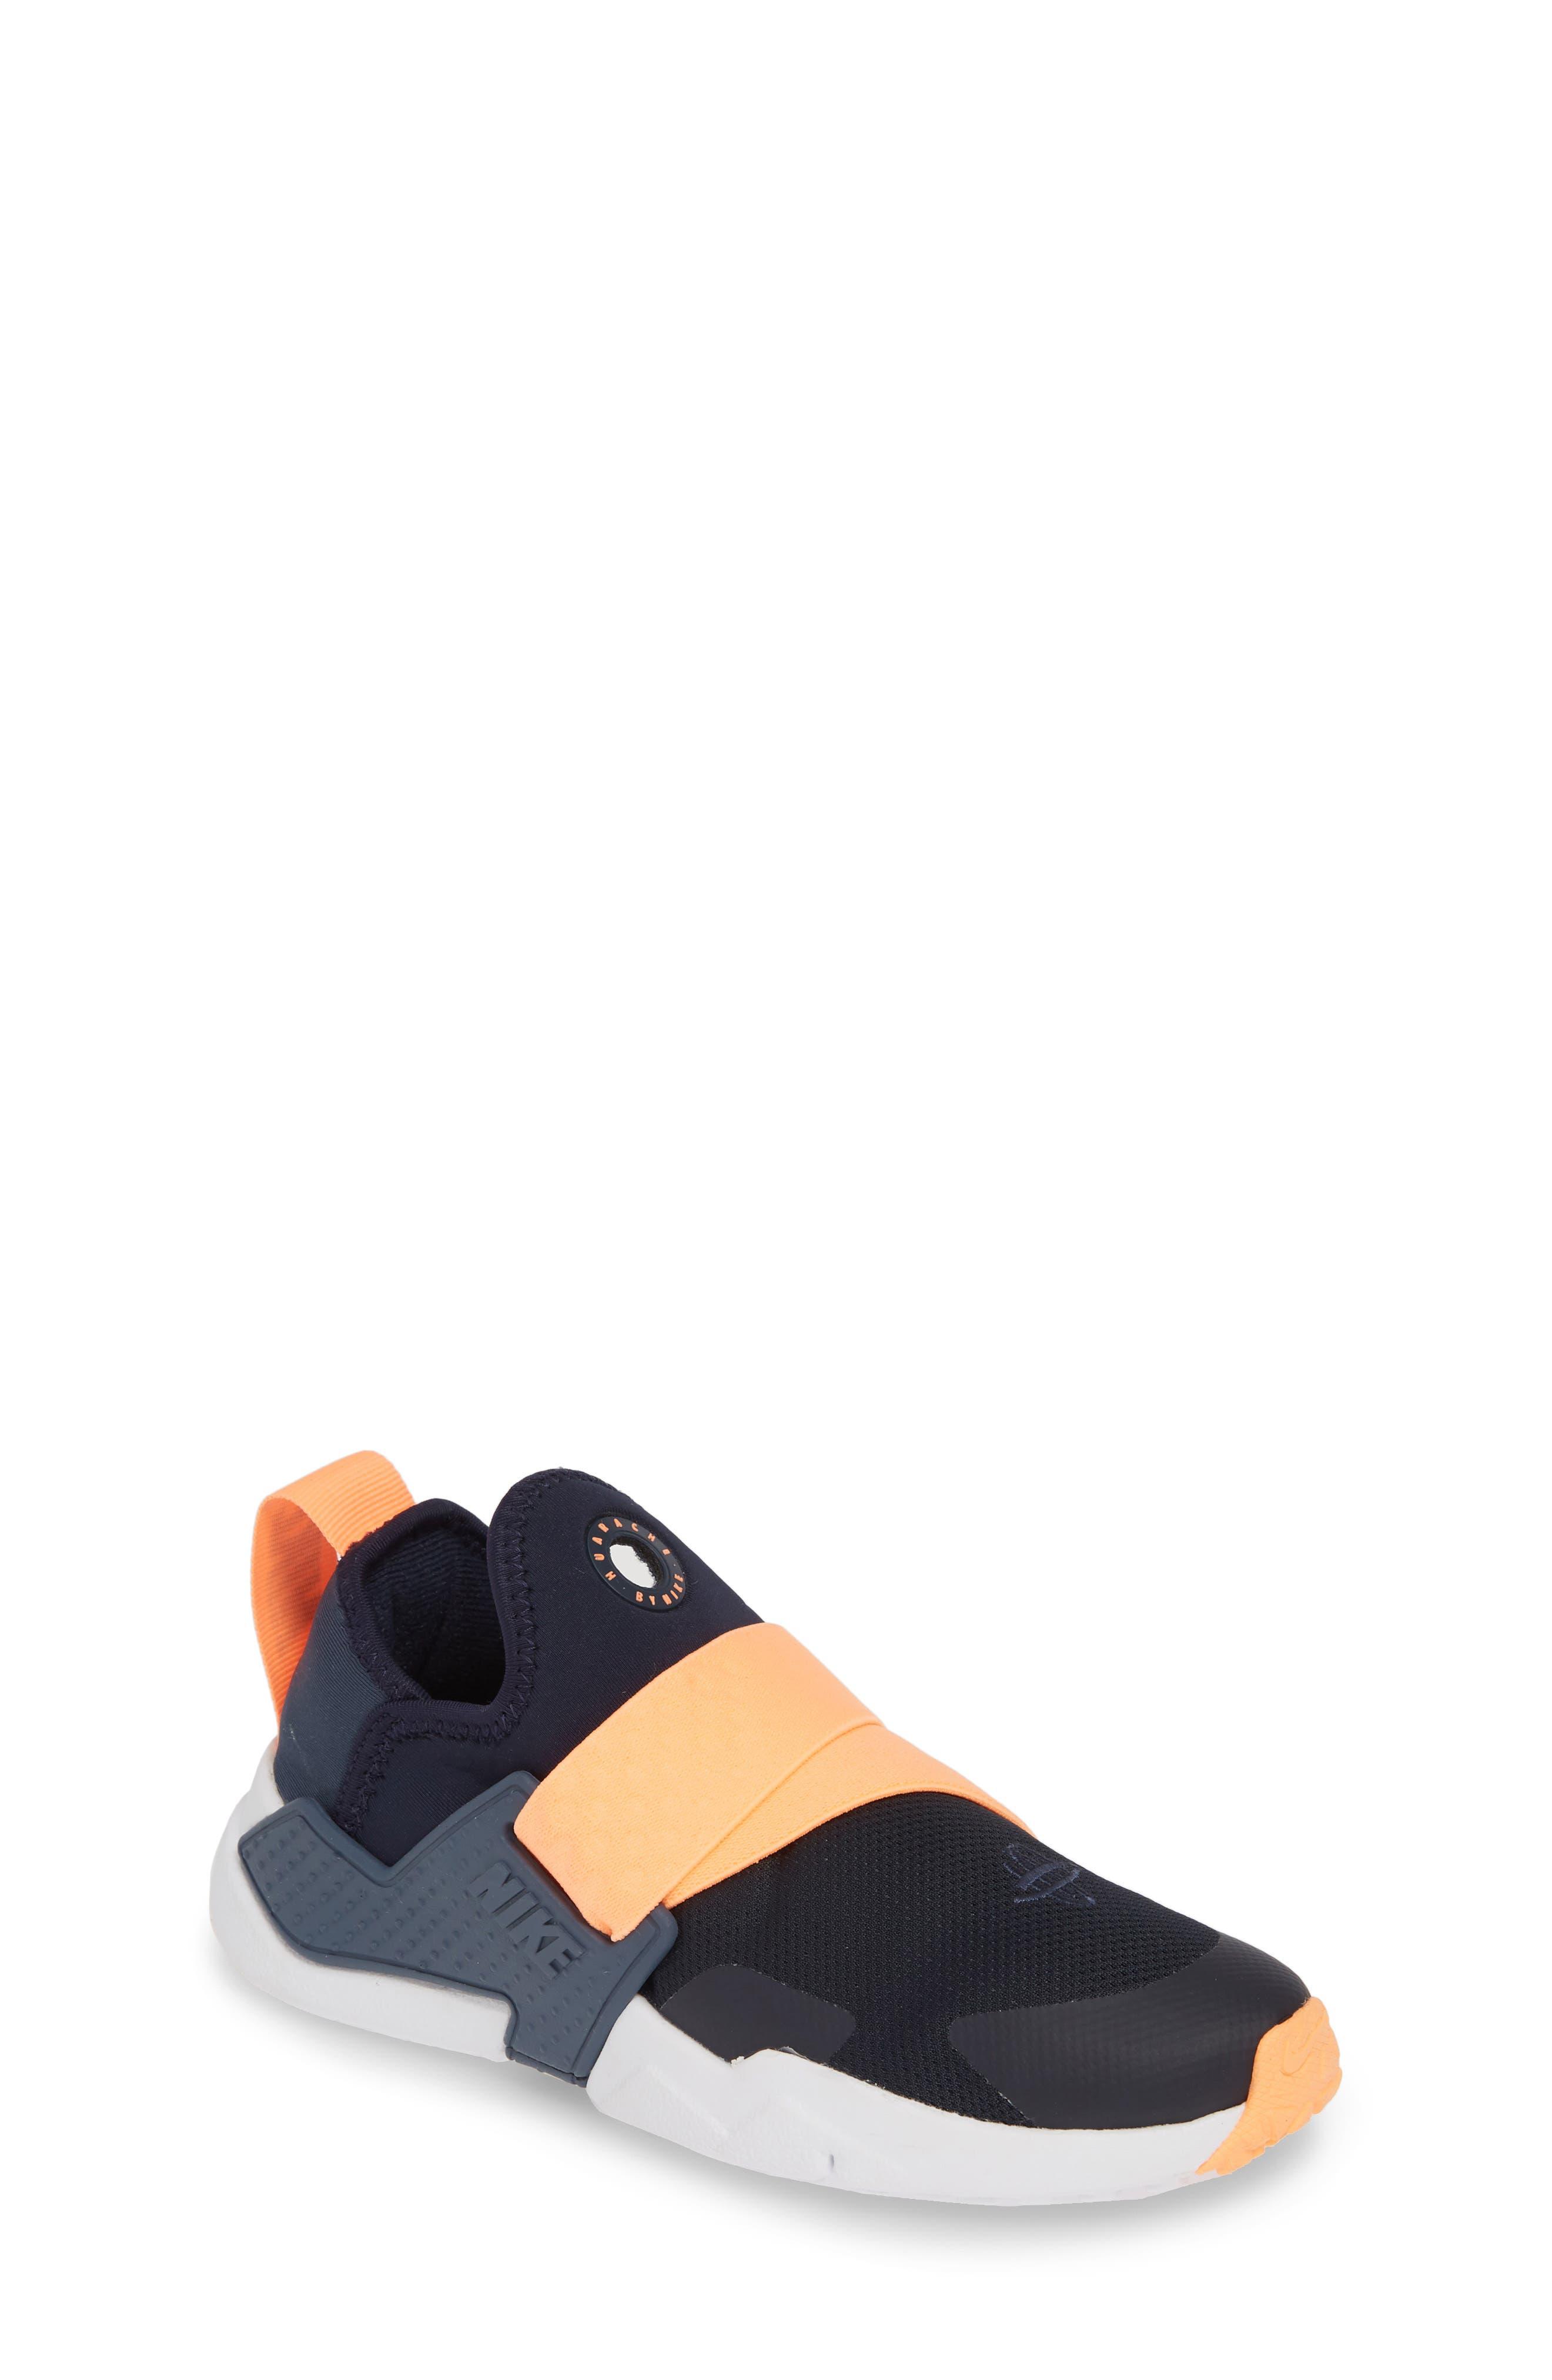 Toddler Nike Huarache Extreme Sneaker Size 12 M  Blue